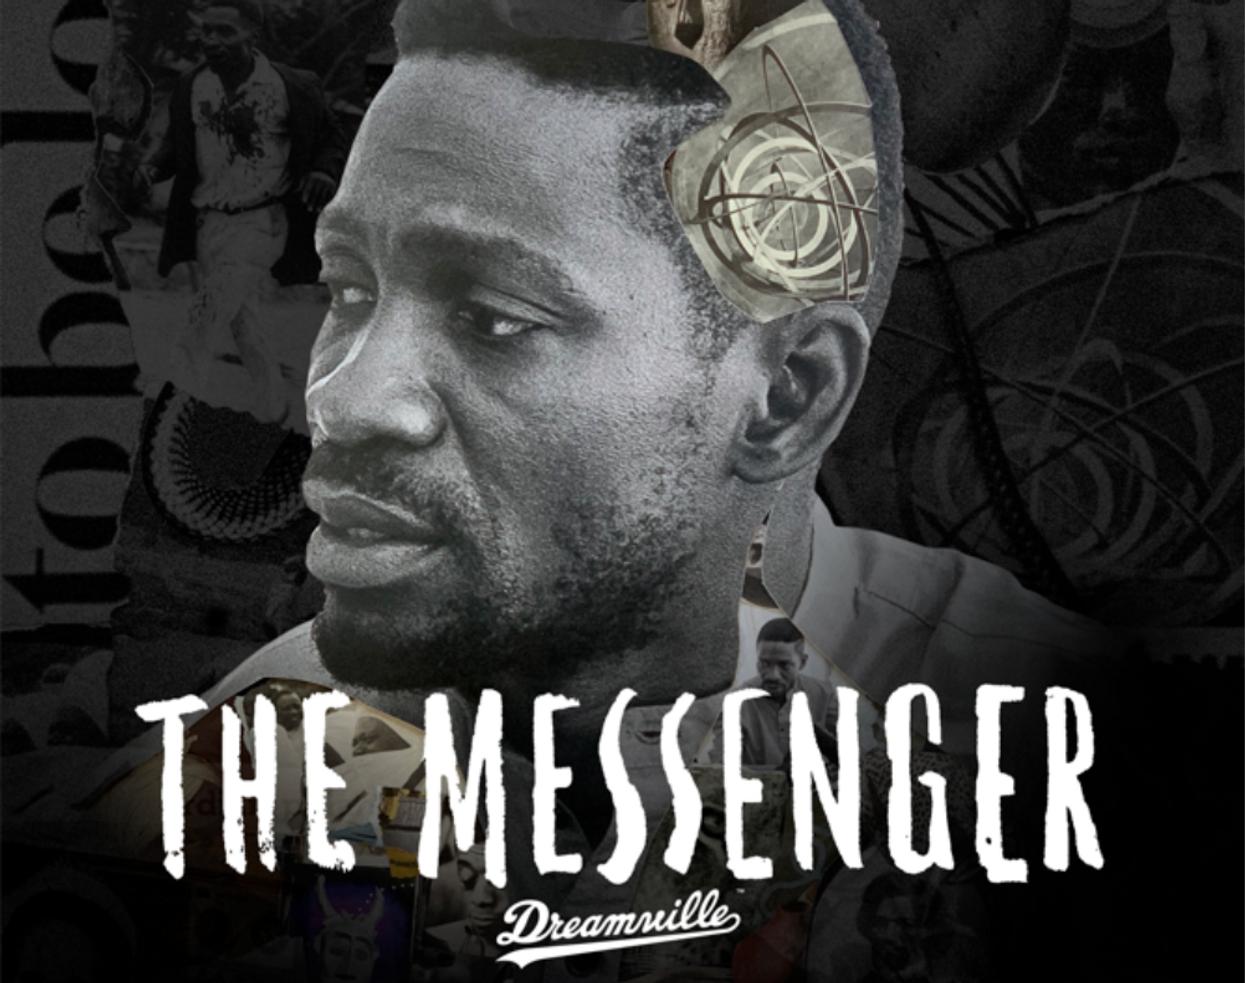 <div>Bobi Wine & Bas Send Off 'The Messenger' In Tell-All Finale</div>